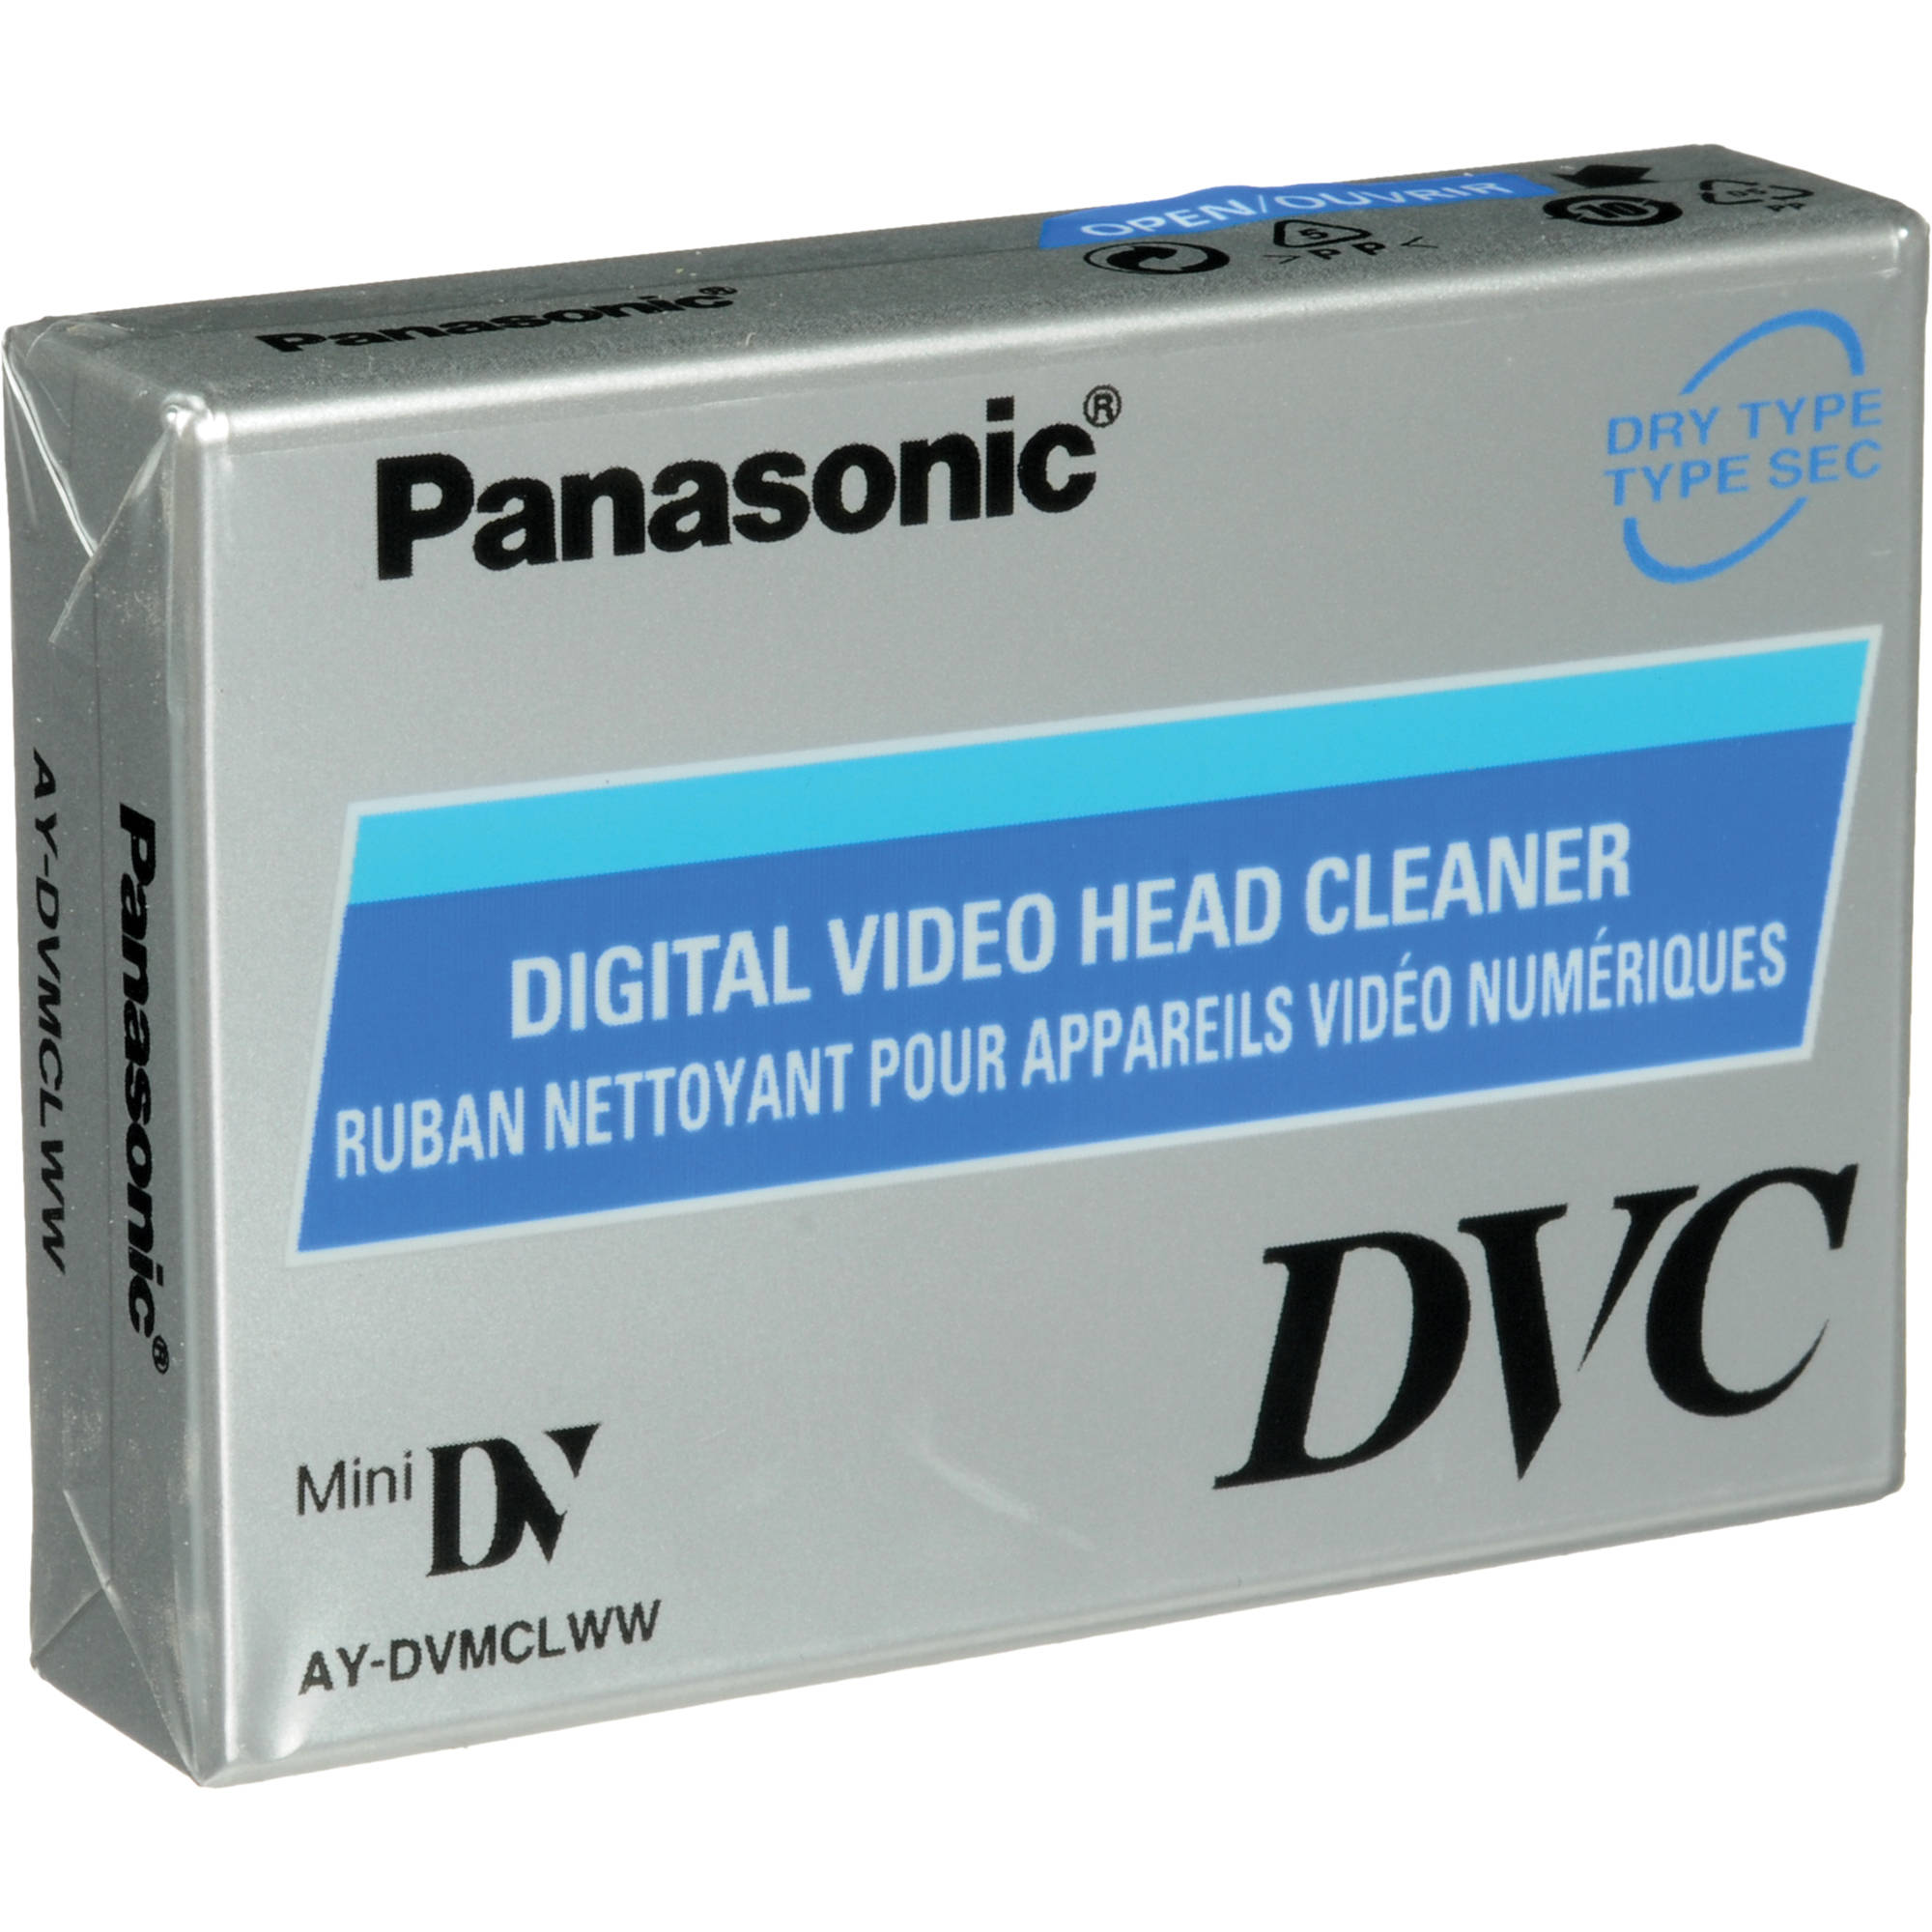 Panasonic AY-DVMCLWW Mini DVCAM/ DV/ HDV Compatible Cleaning Cassette